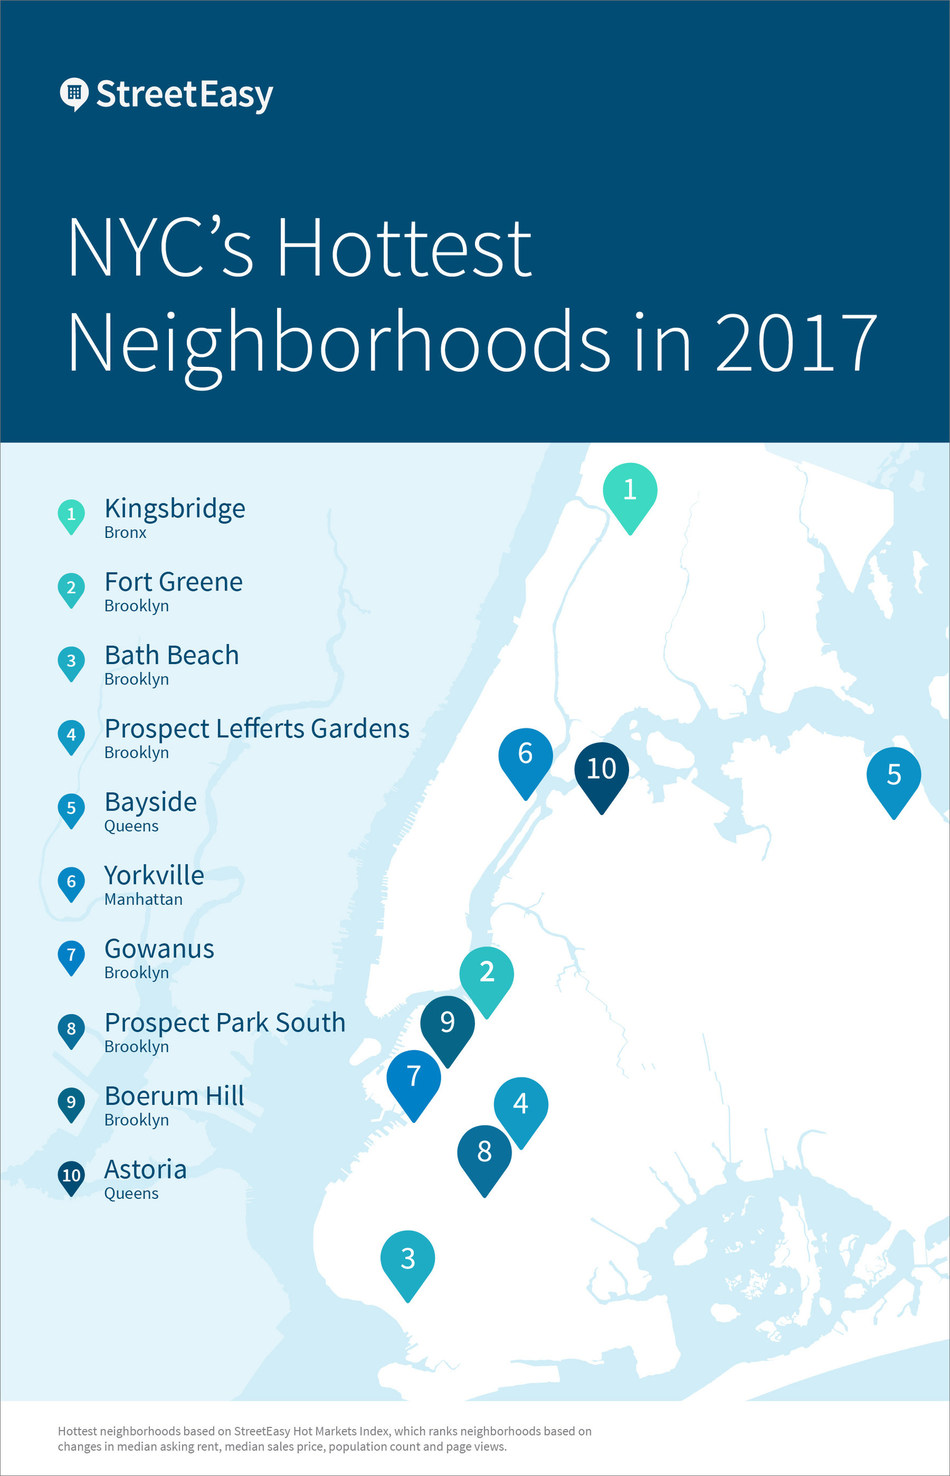 Bronx's Kingsbridge tops StreetEasy's list of NYC's hottest neighborhoods in 2017